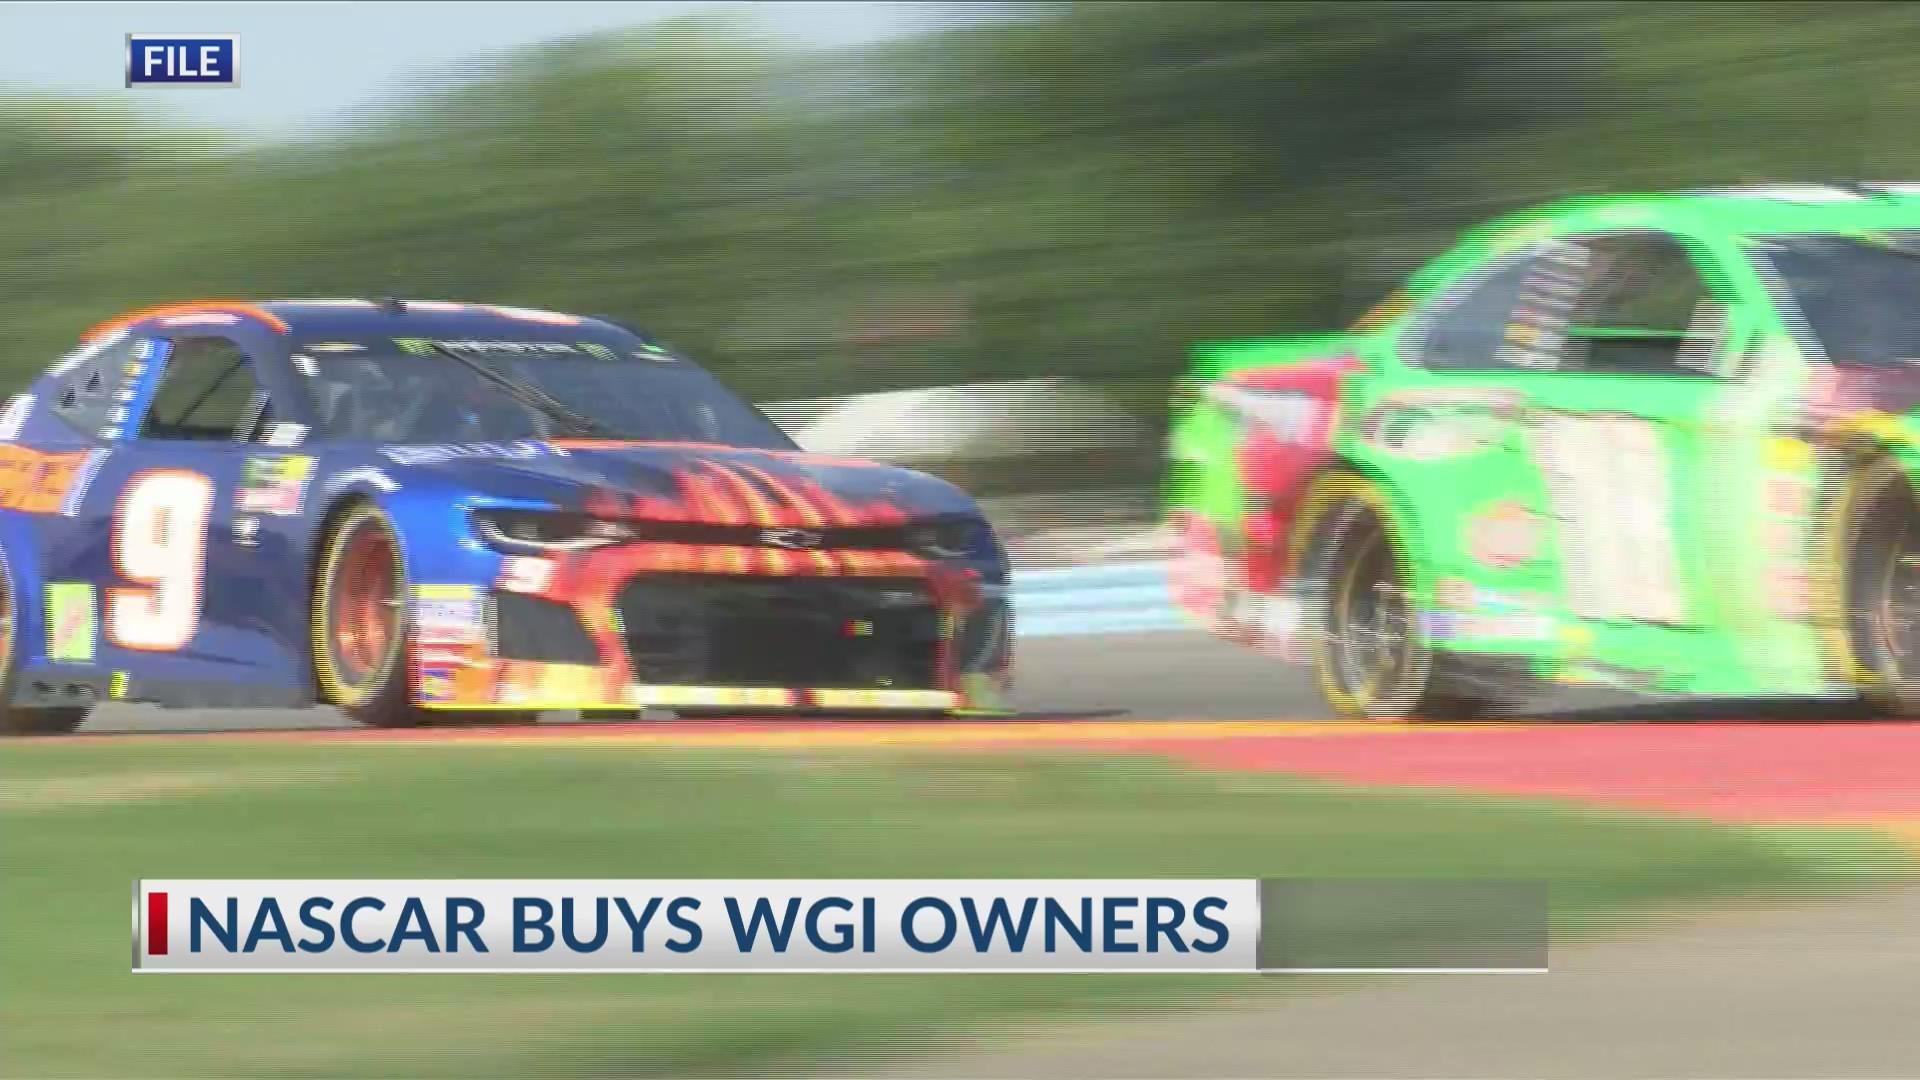 NASCAR buys WGI owners